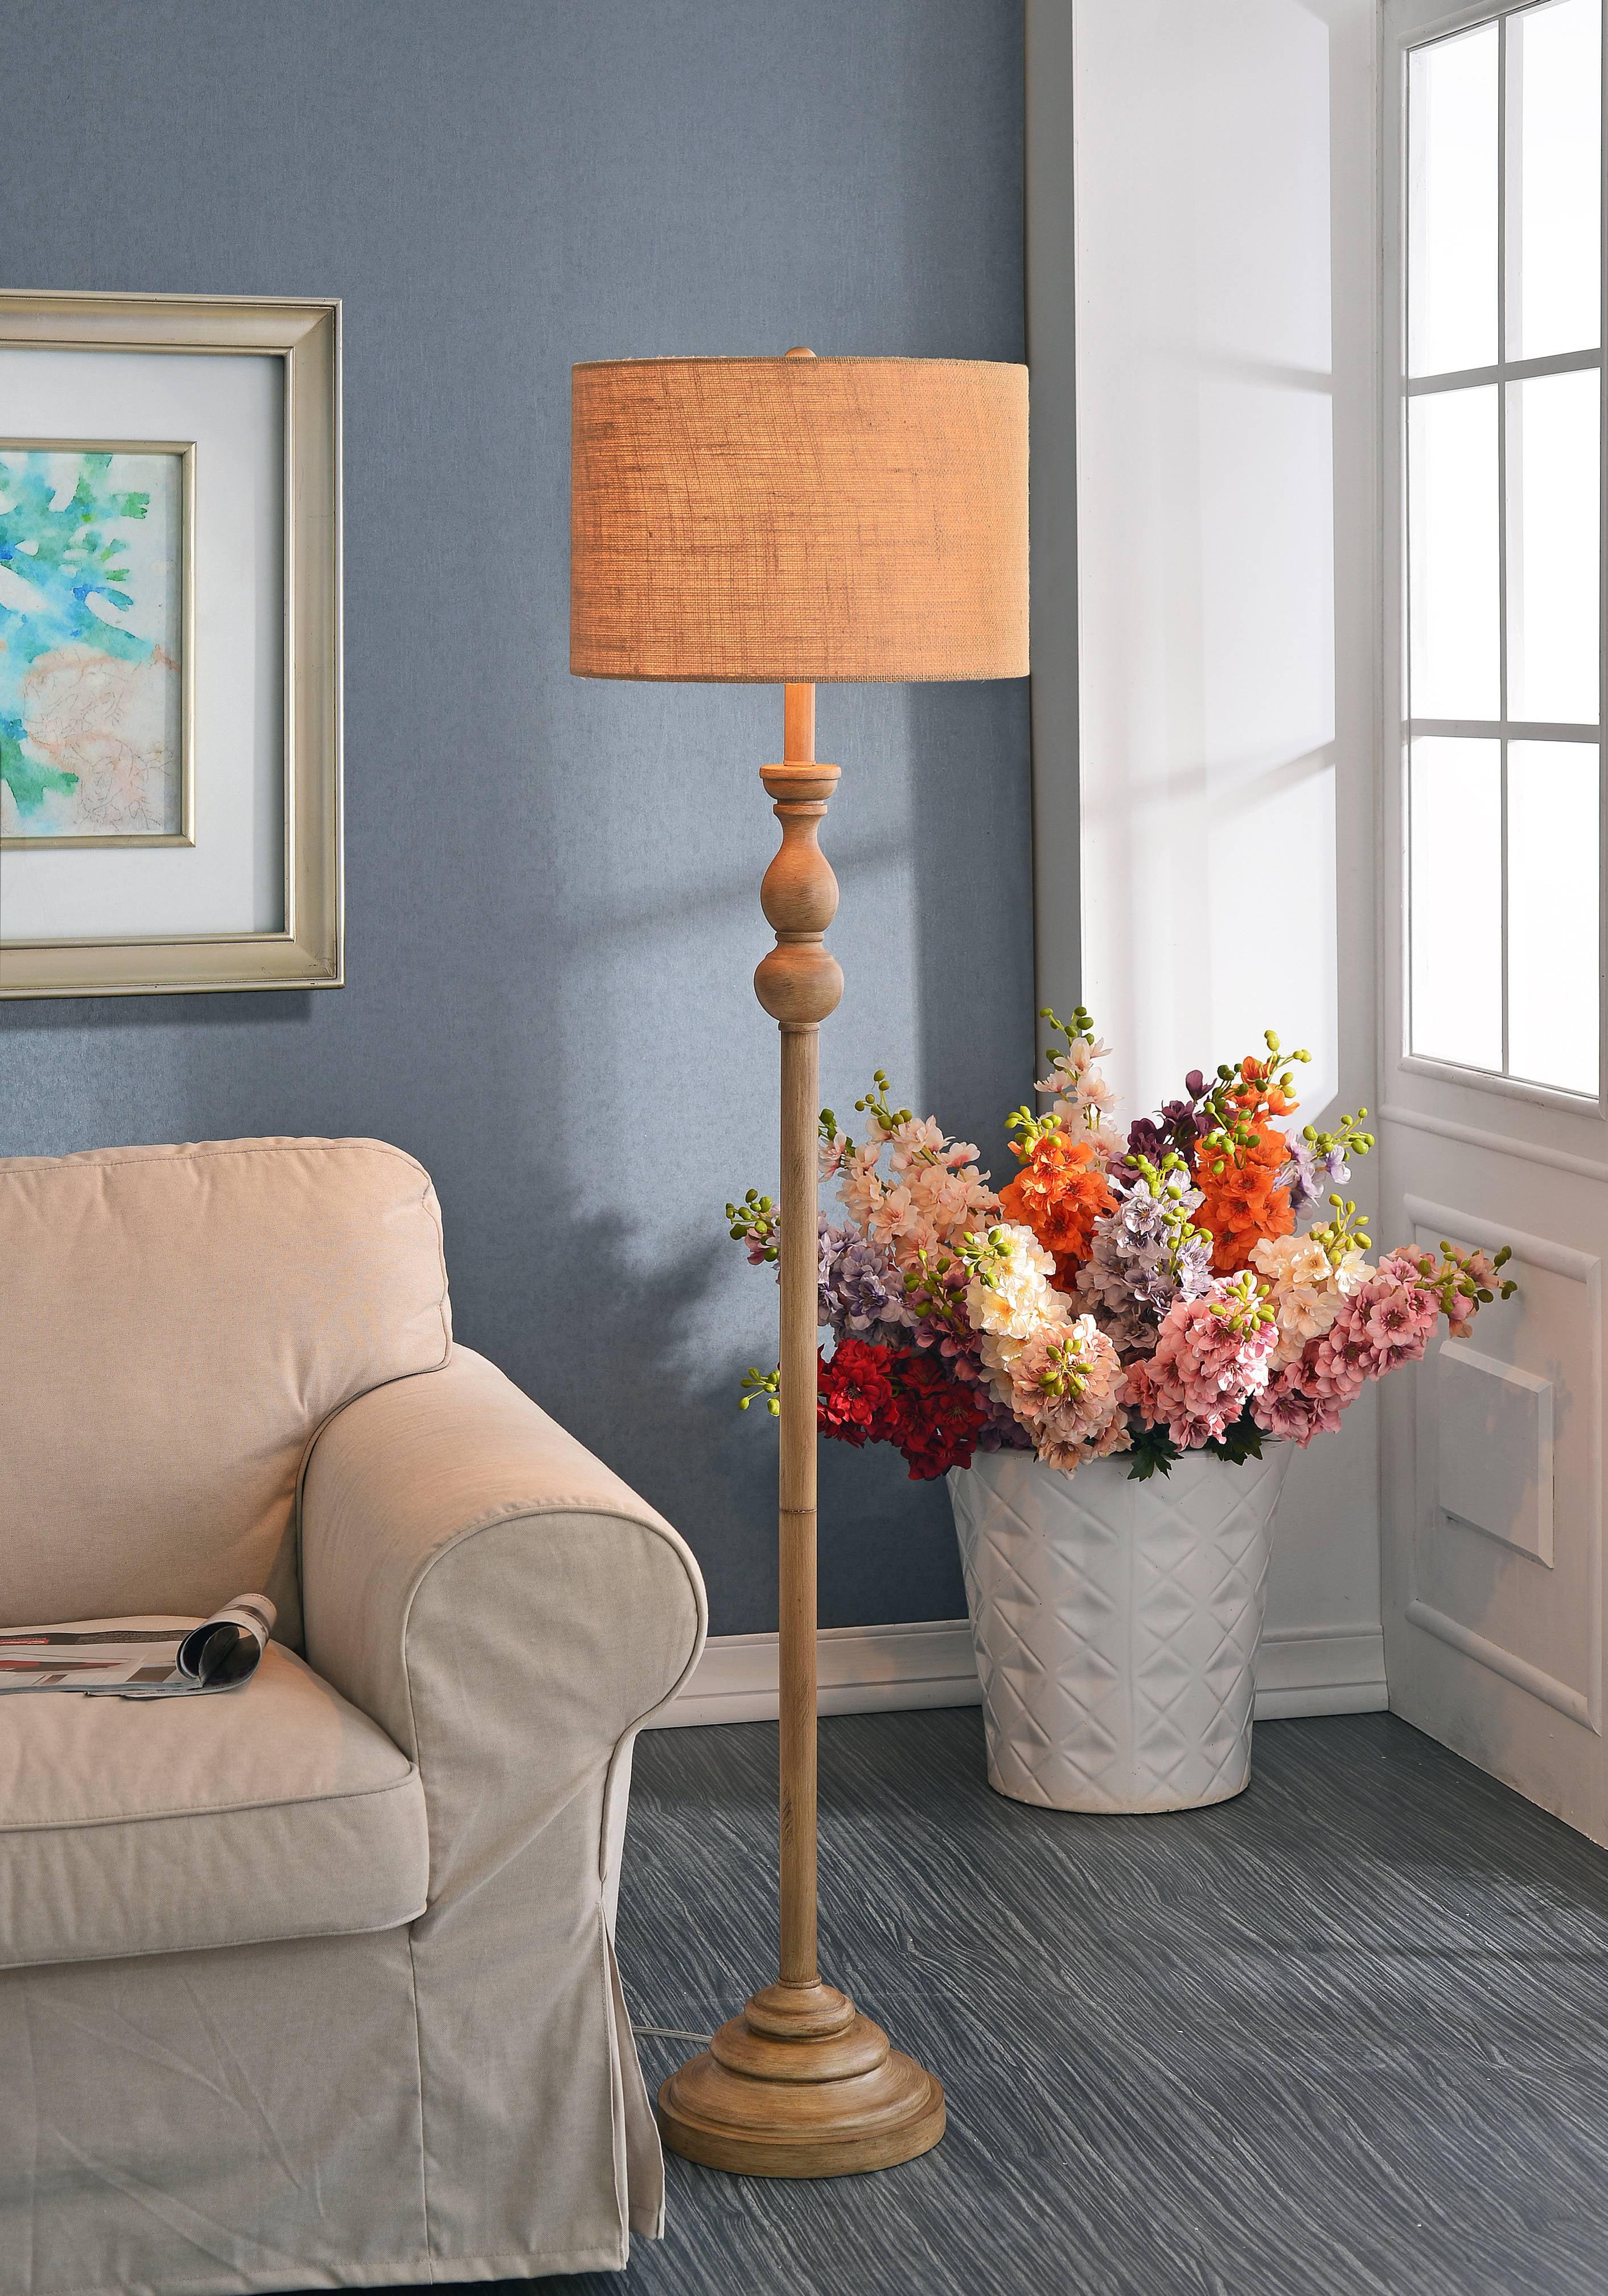 3-way Bennett Floor Lamp Toasted Almond Finish - Kenroy Home